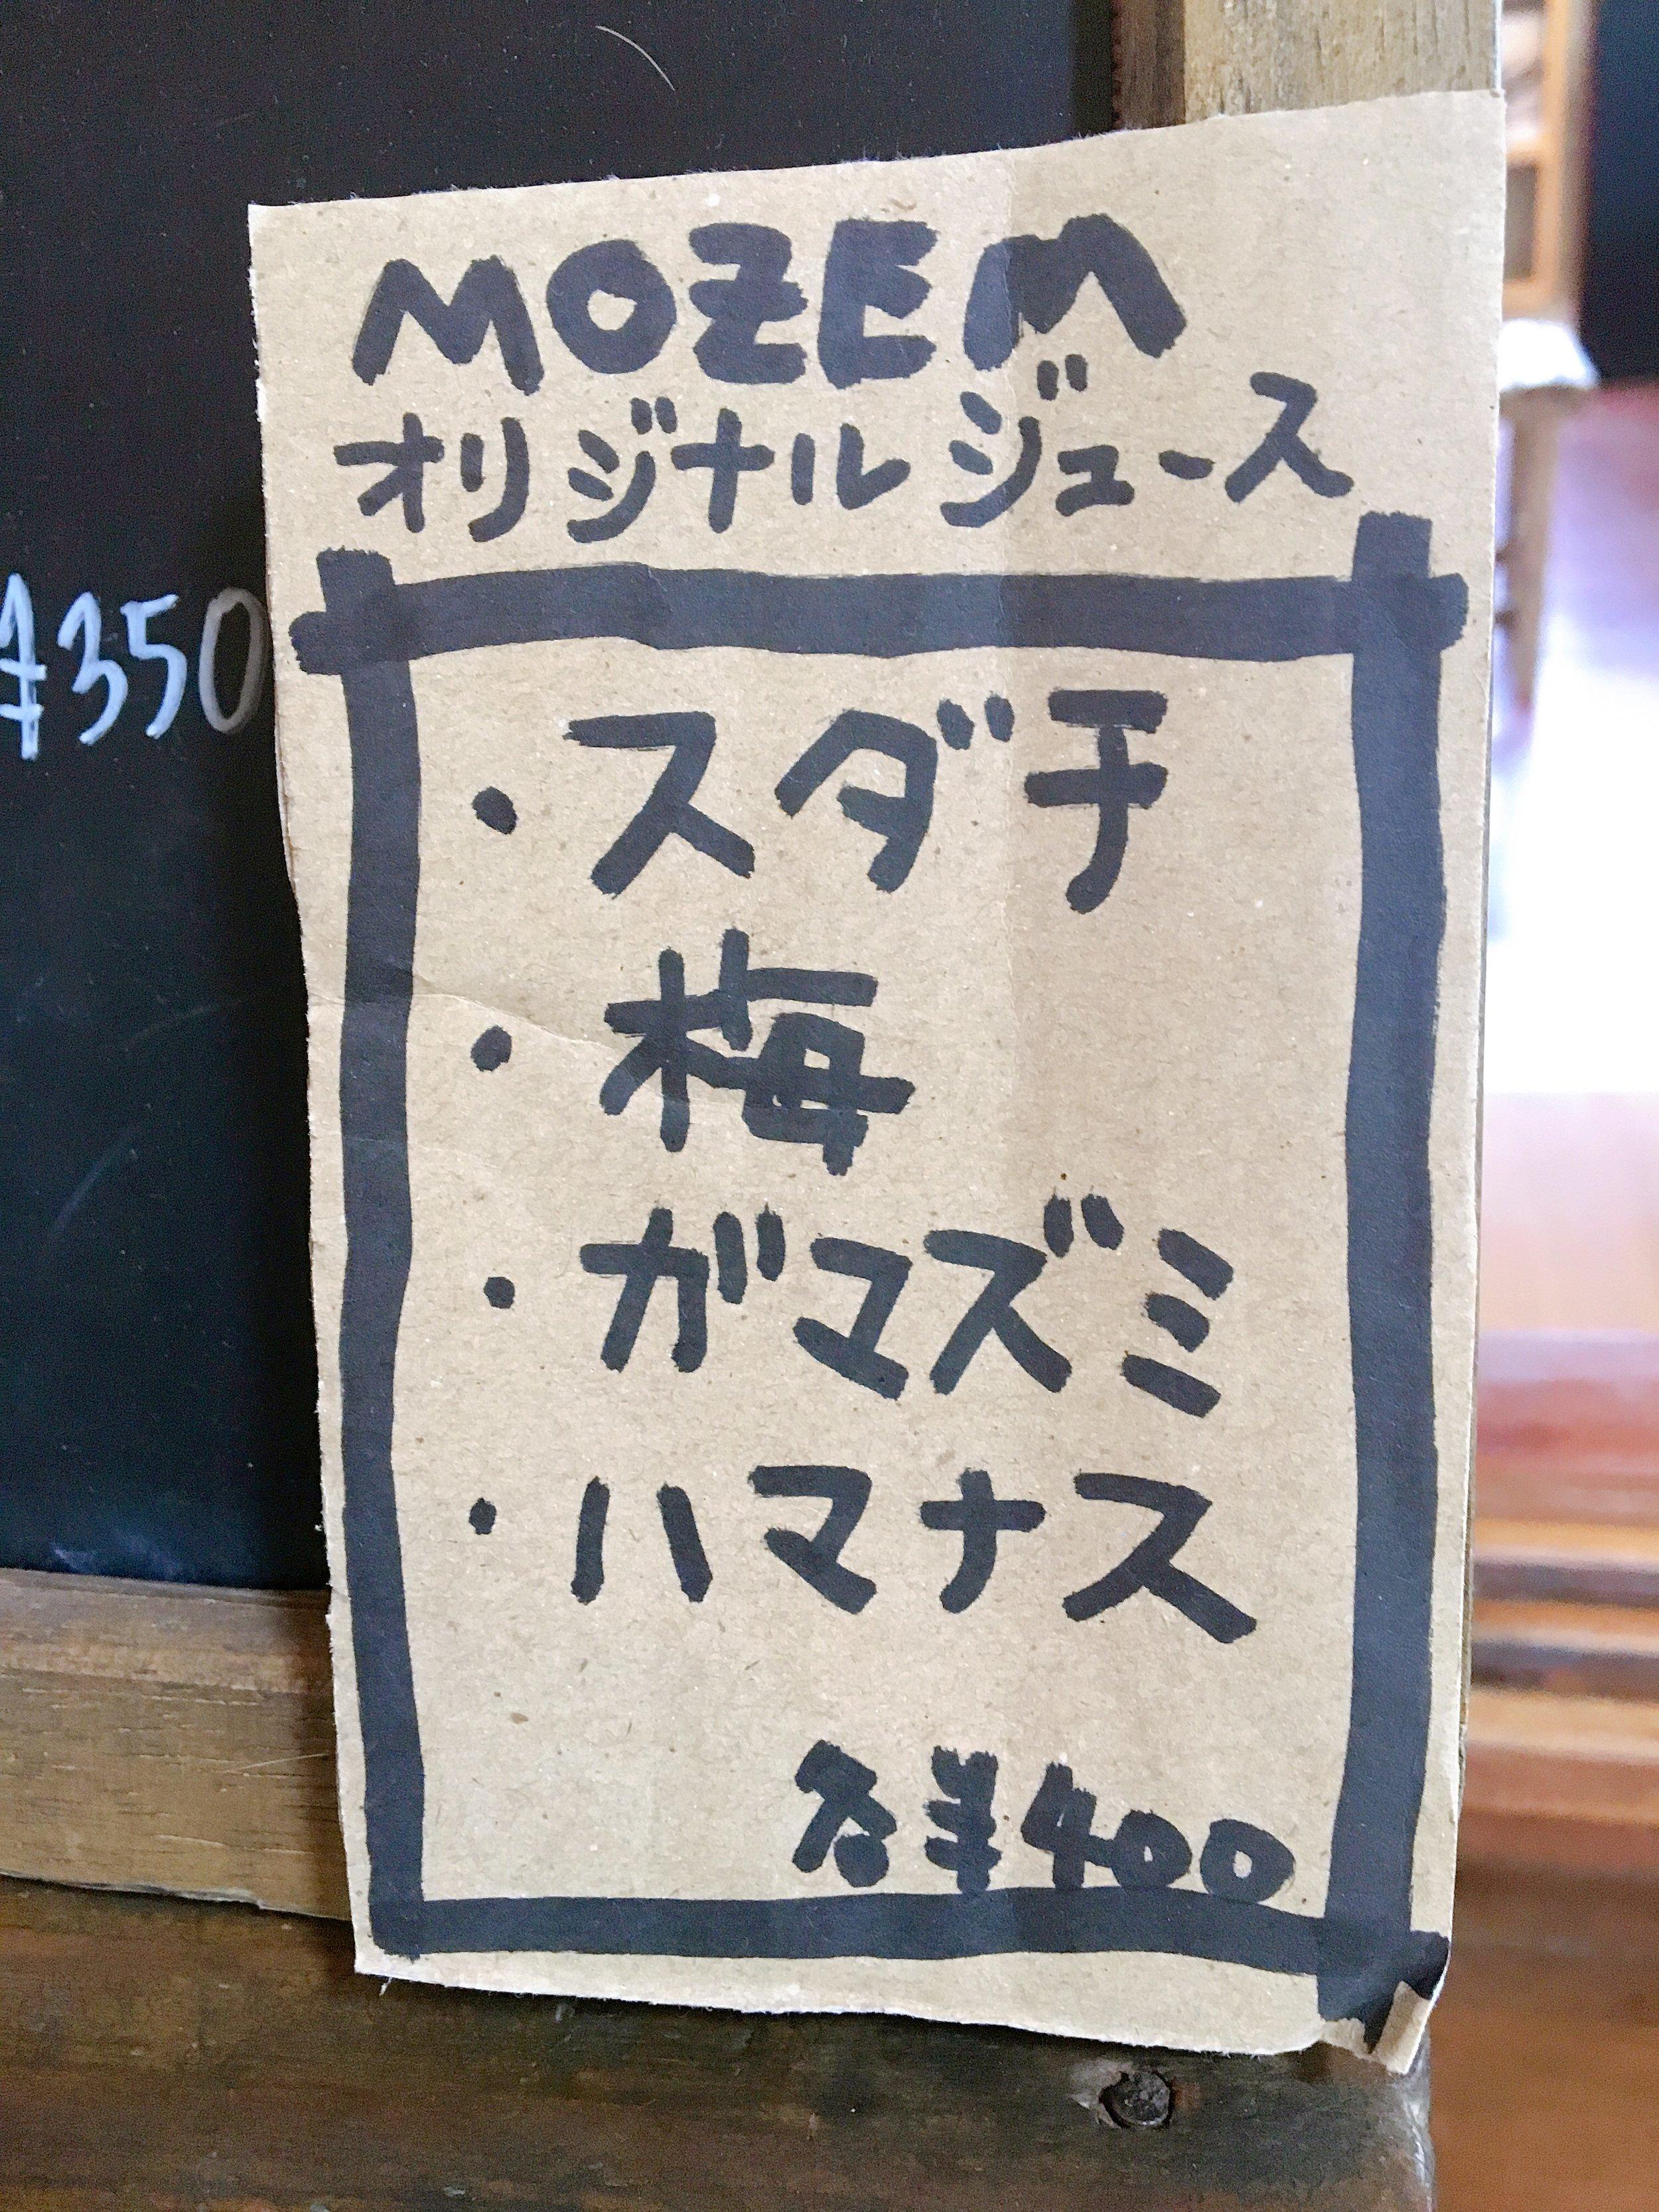 「MOZEMオリジナルジュース」